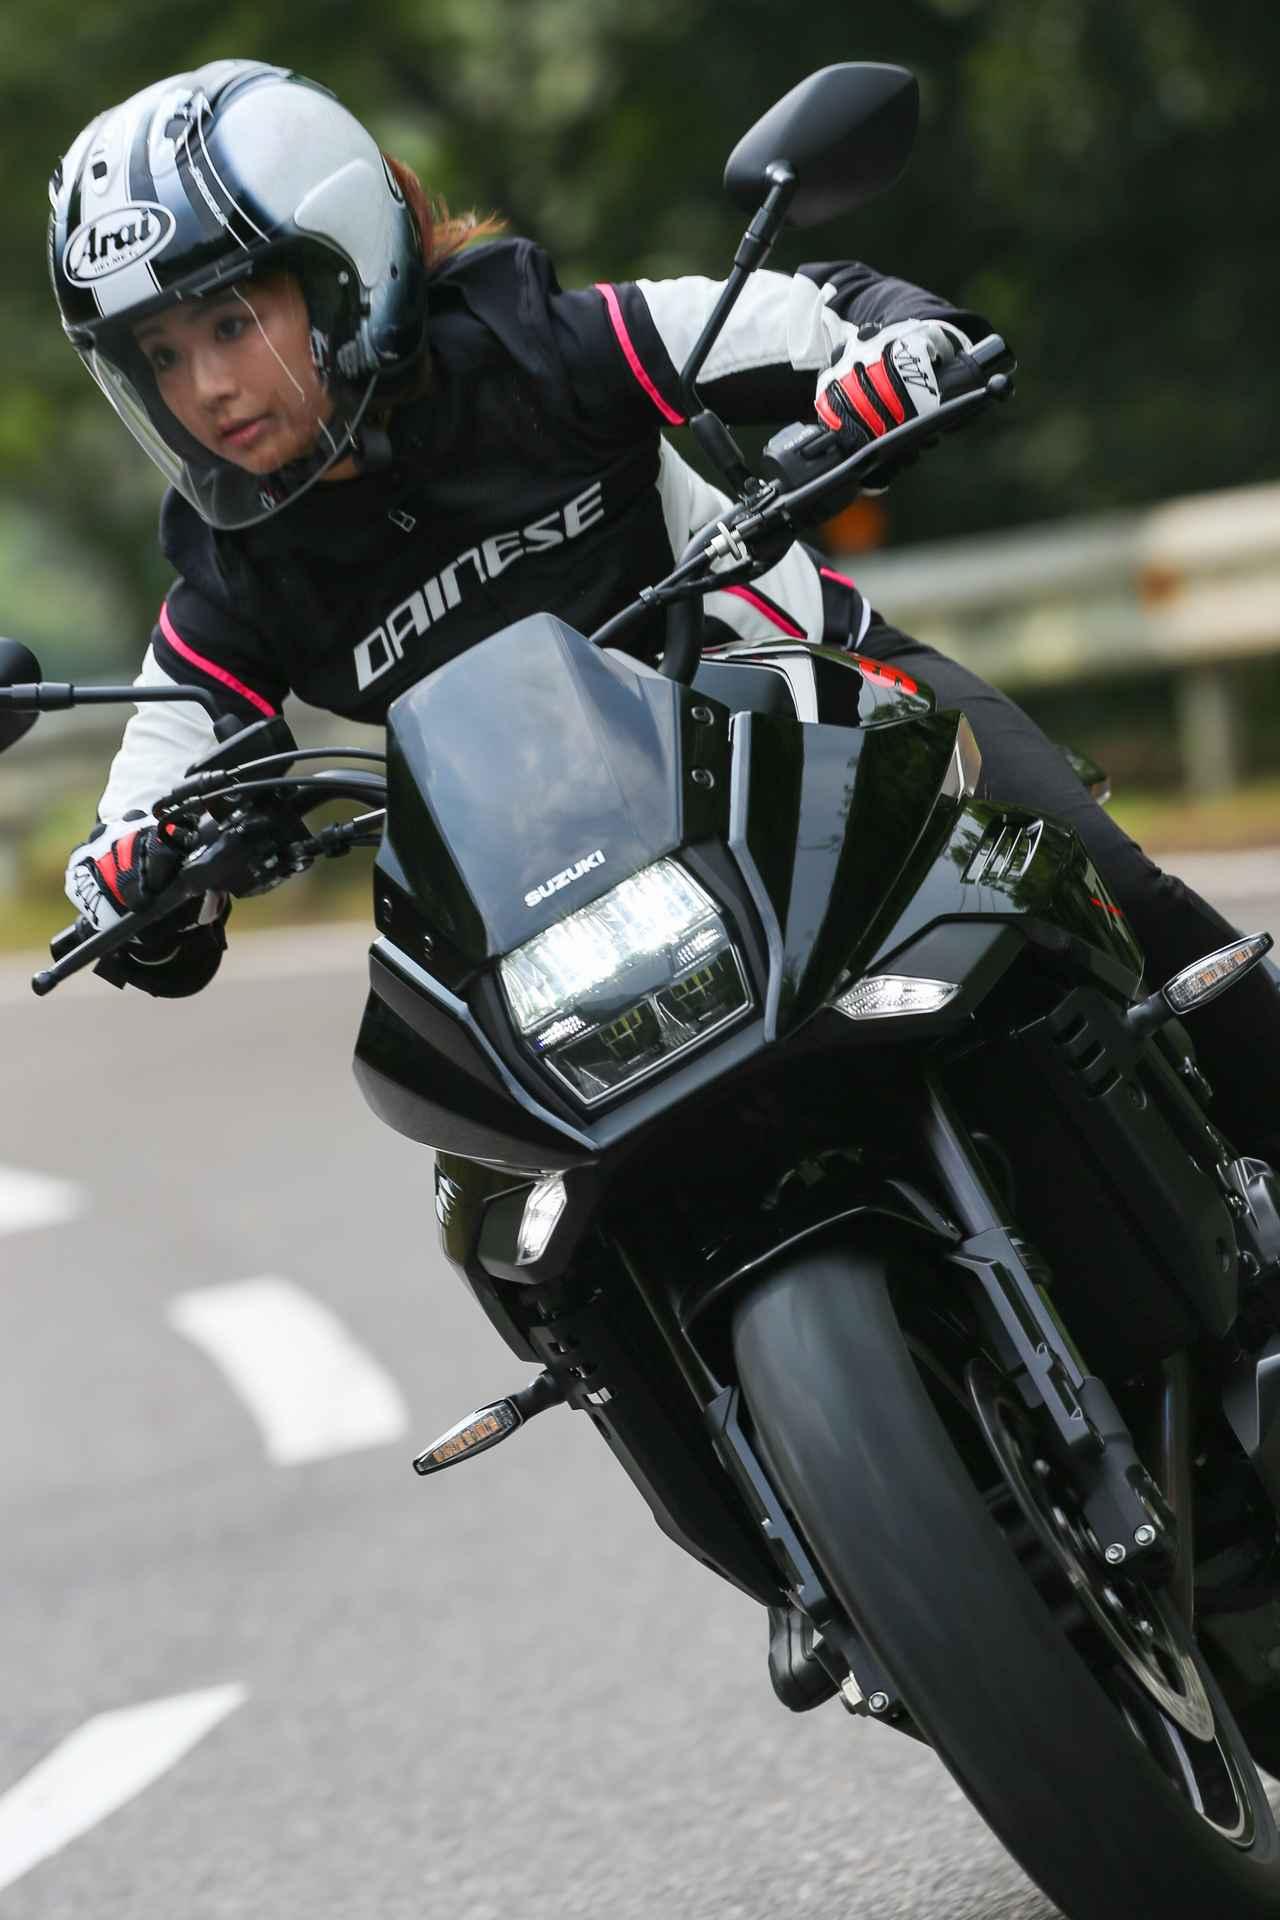 Images : 5番目の画像 - 「平嶋夏海の「つま先メモリアル」(第5回:Suzuki KATANA)【ゆるふわ 3枚刃】」のアルバム - LAWRENCE - Motorcycle x Cars + α = Your Life.